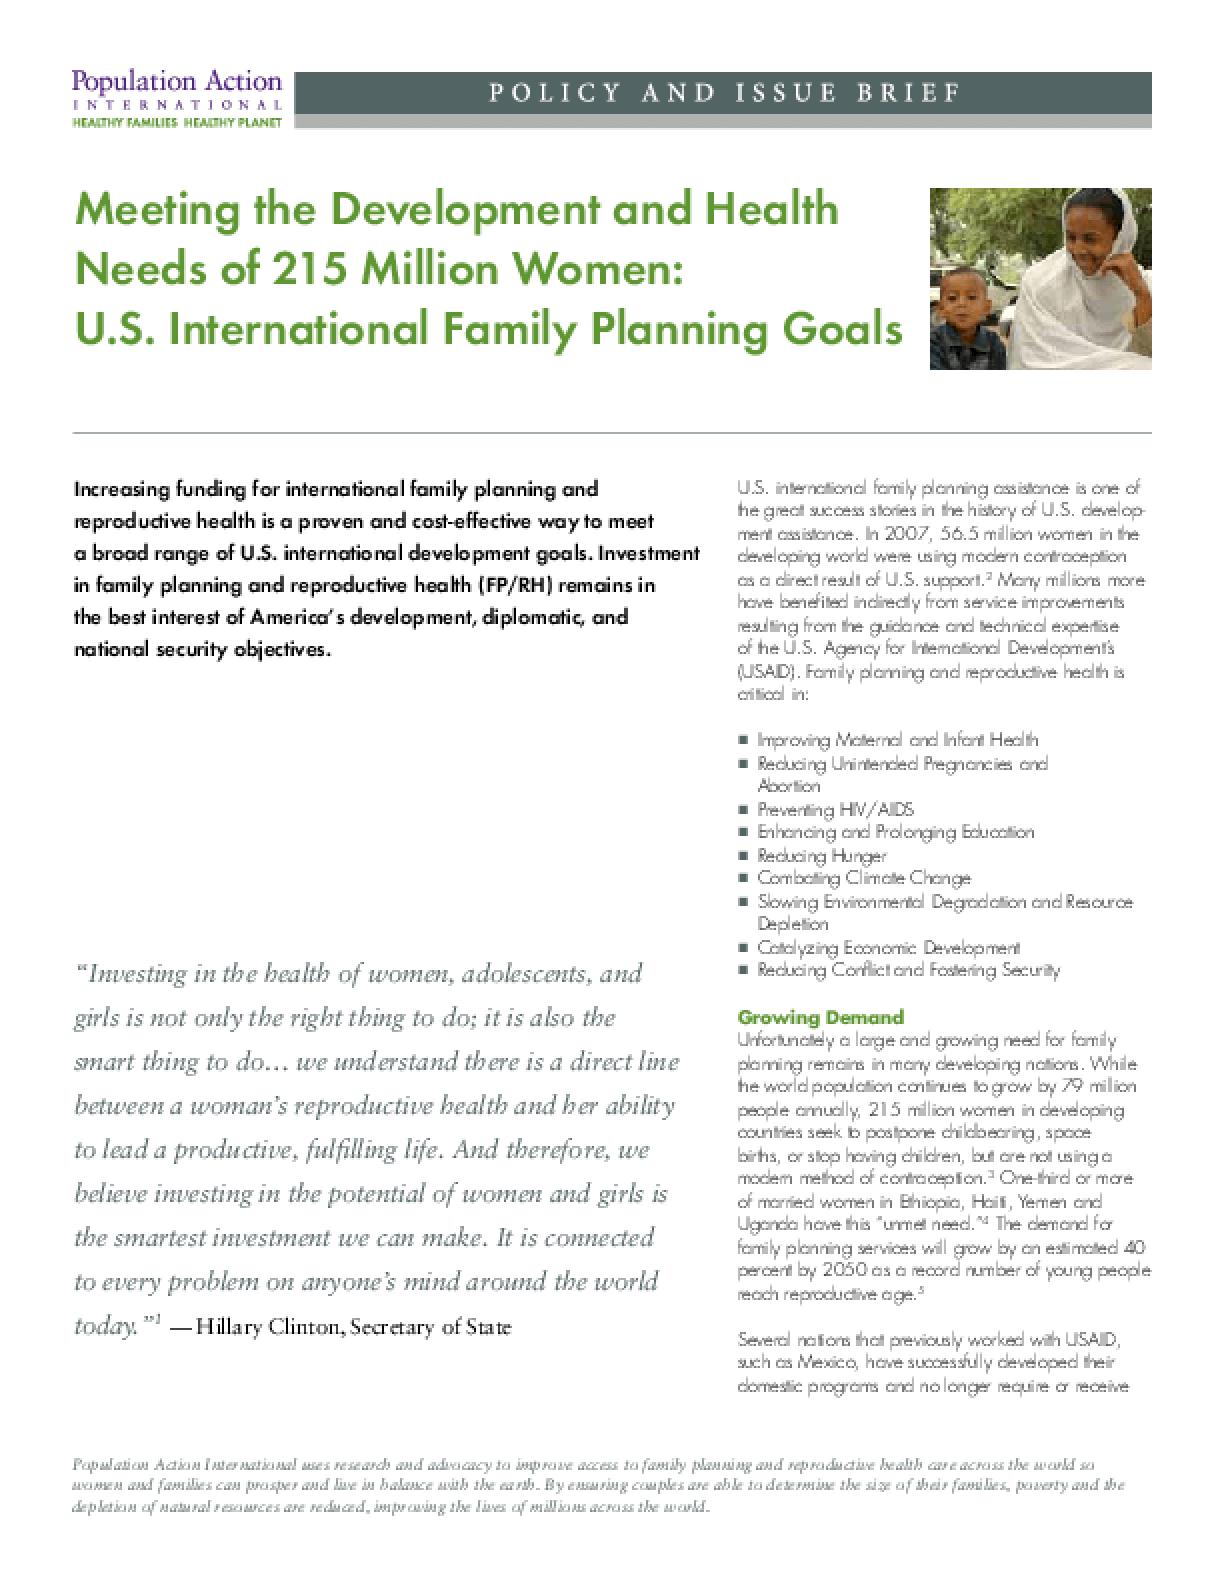 Meeting the Development and Health Needs of 215 Million Women: U.S. International Family Planning Goals